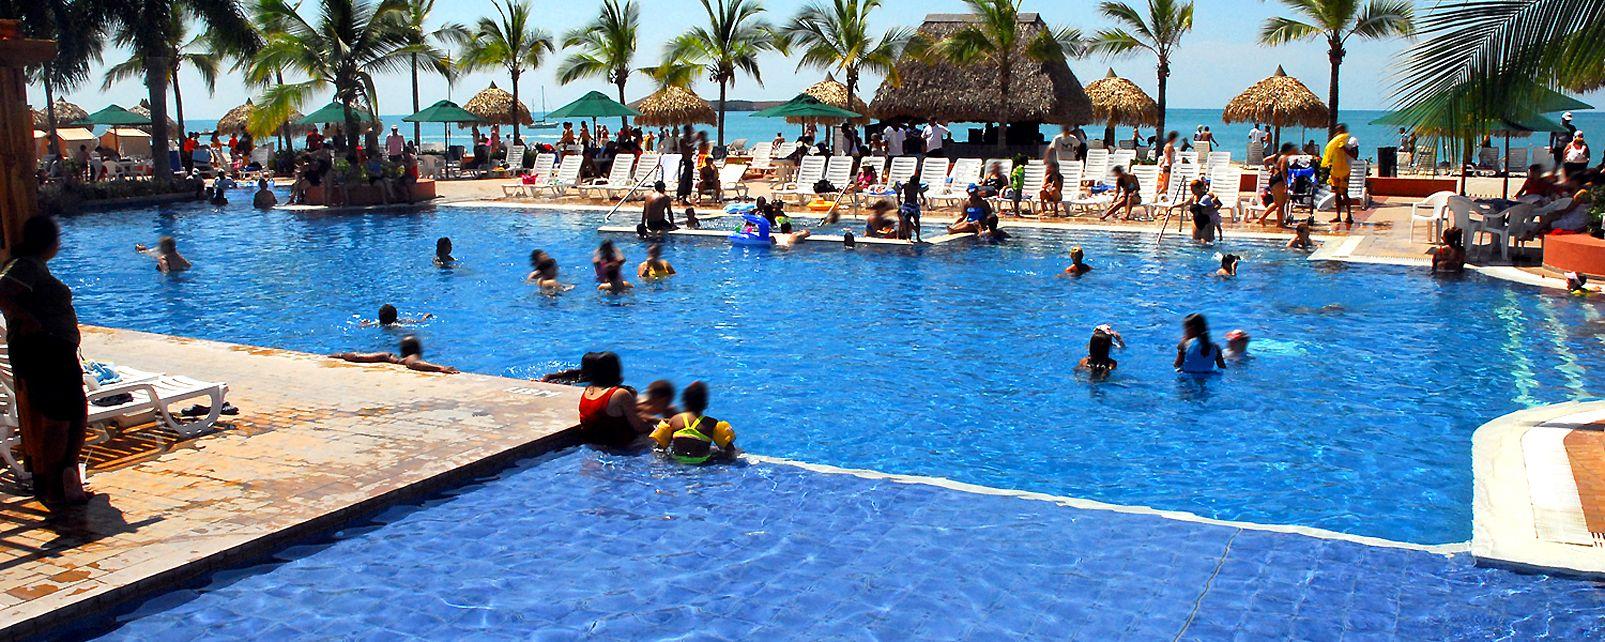 Hôtel Royal Decameron Beach Resort and Casino